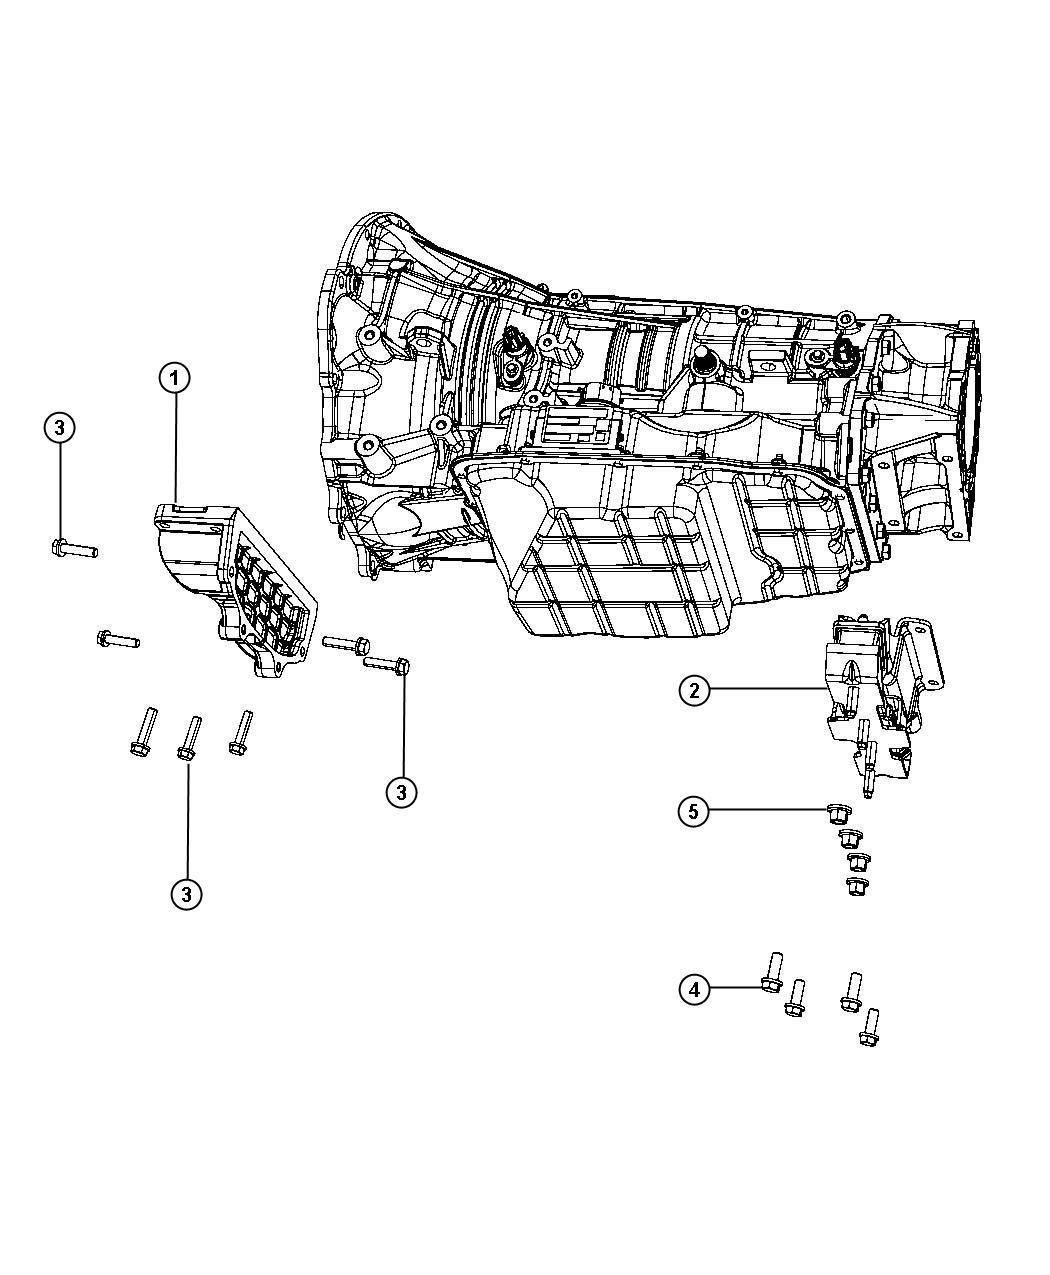 2012 dodge ram 1500 bracket  transmission mount  body 61  for body 61 and 62  for body 61  62